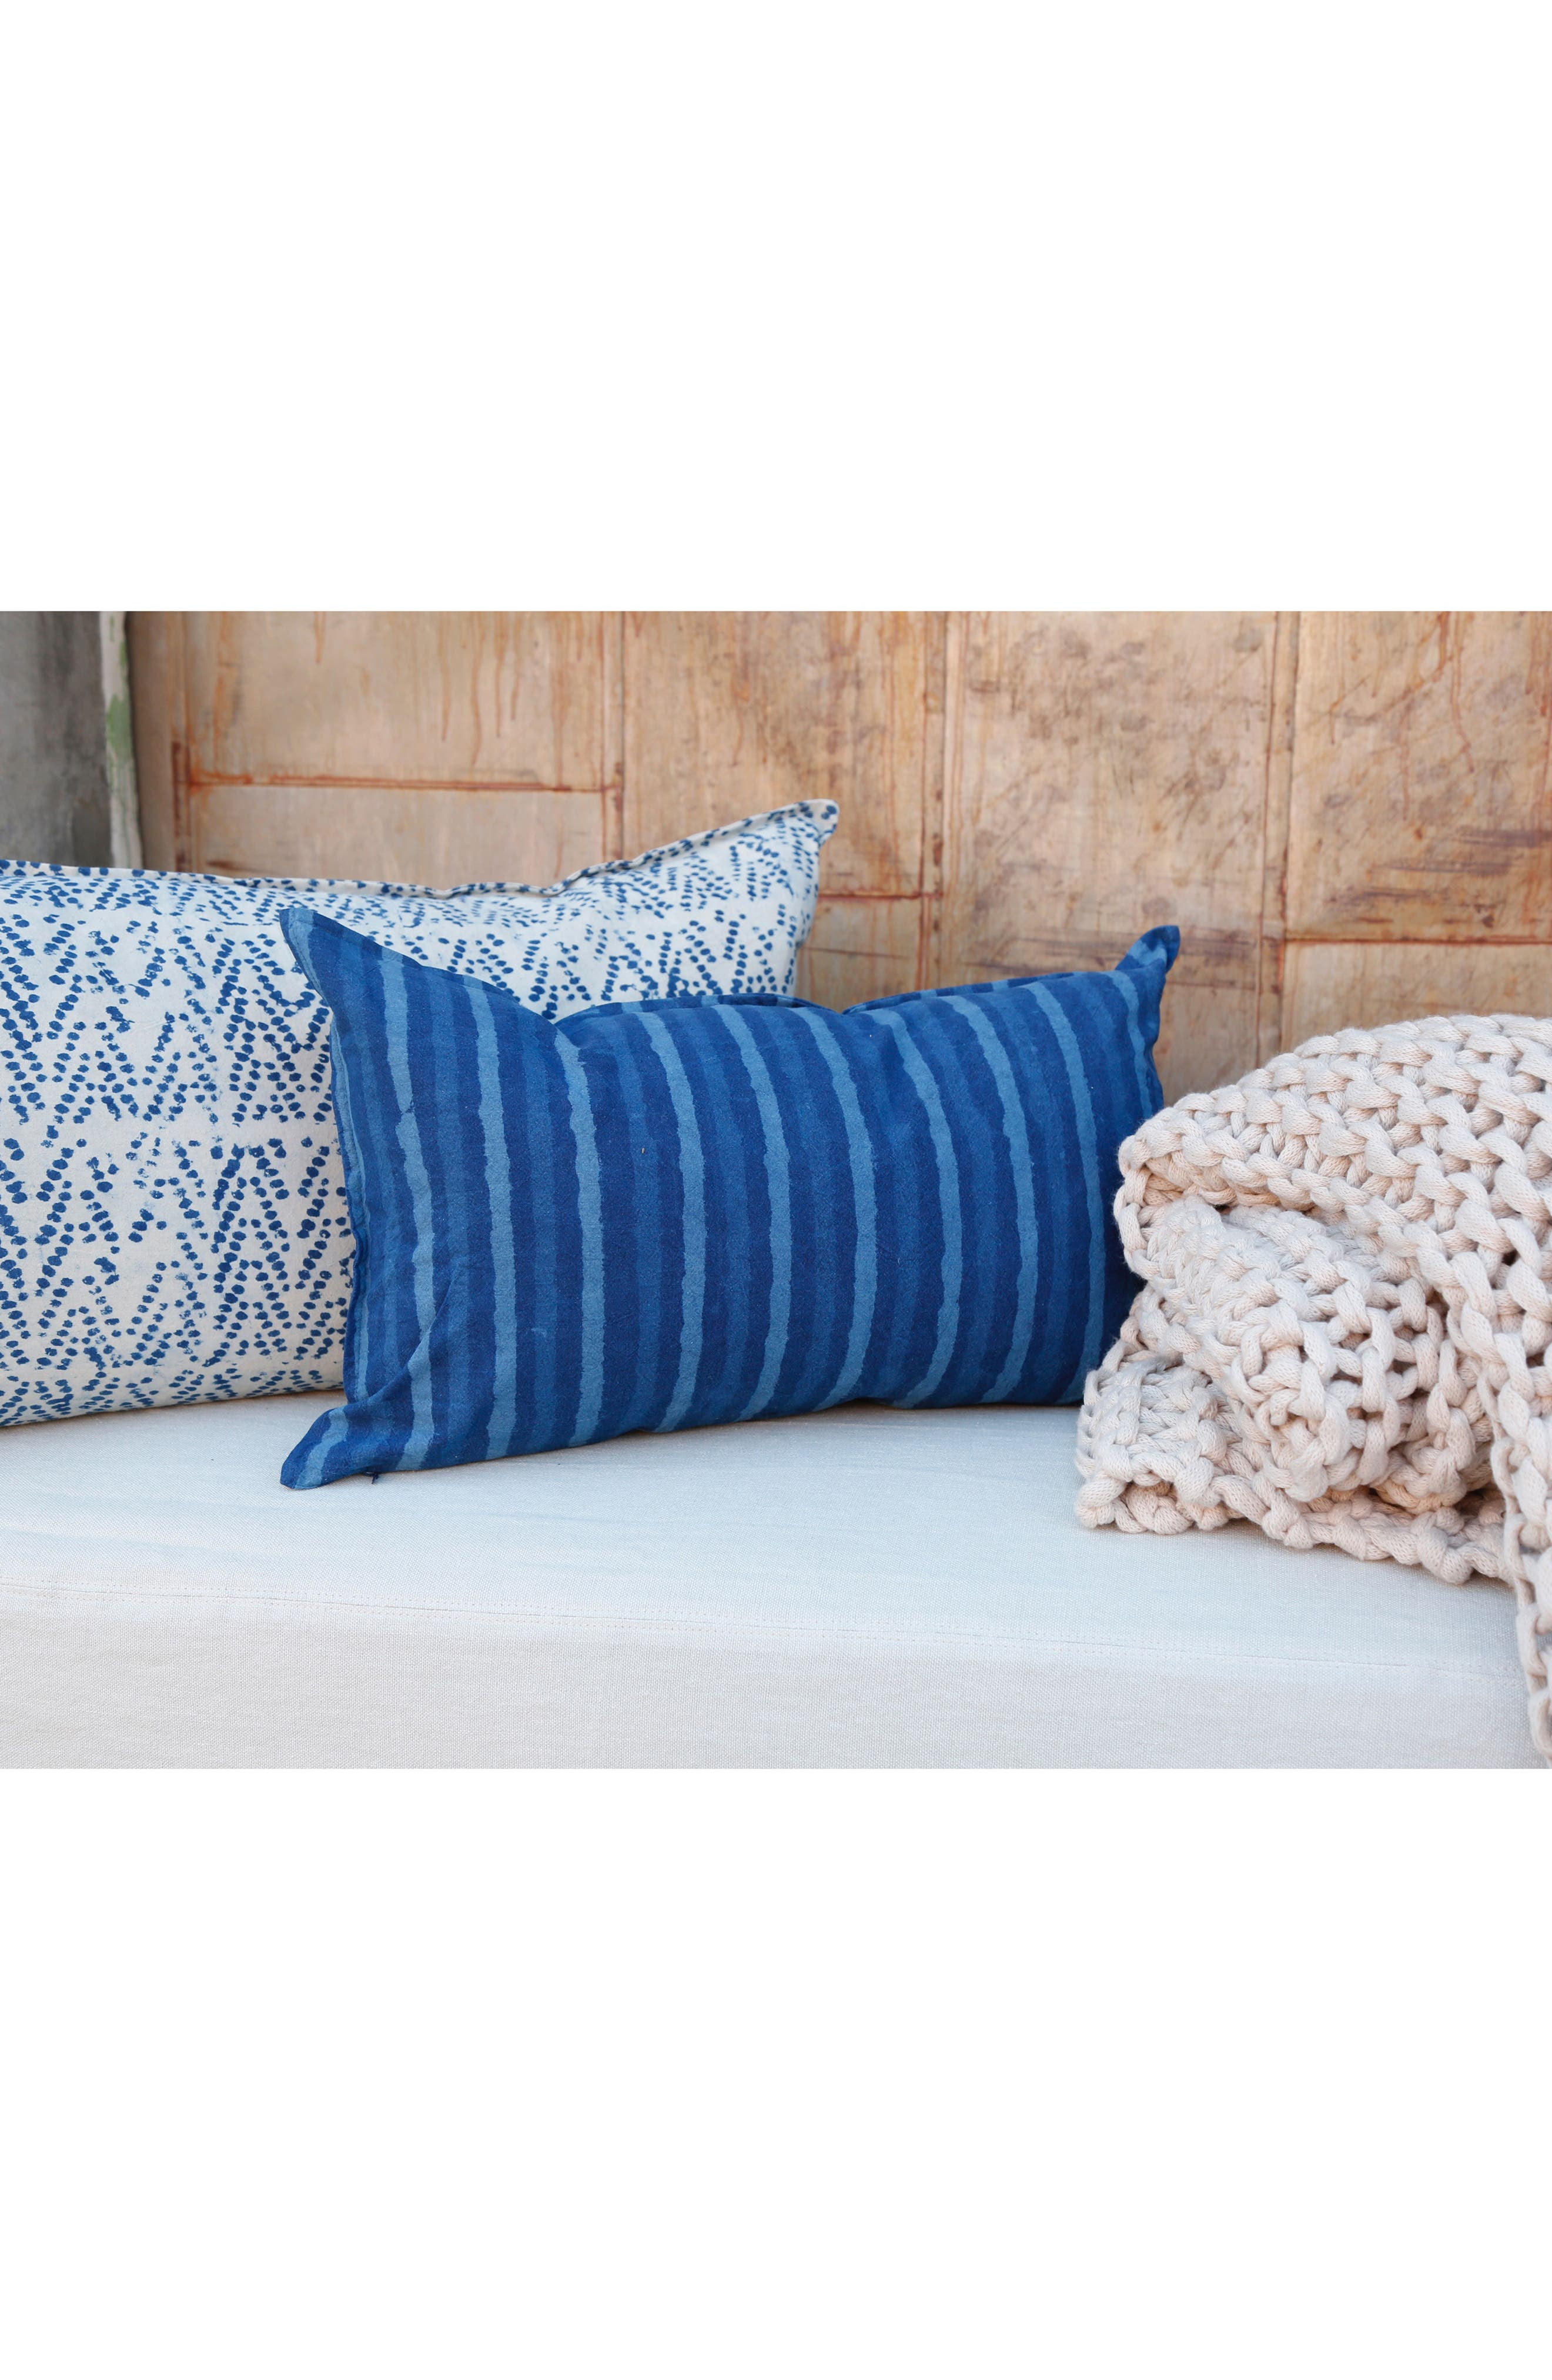 Indigo Stripe Accent Pillow,                             Alternate thumbnail 2, color,                             Blue Multi